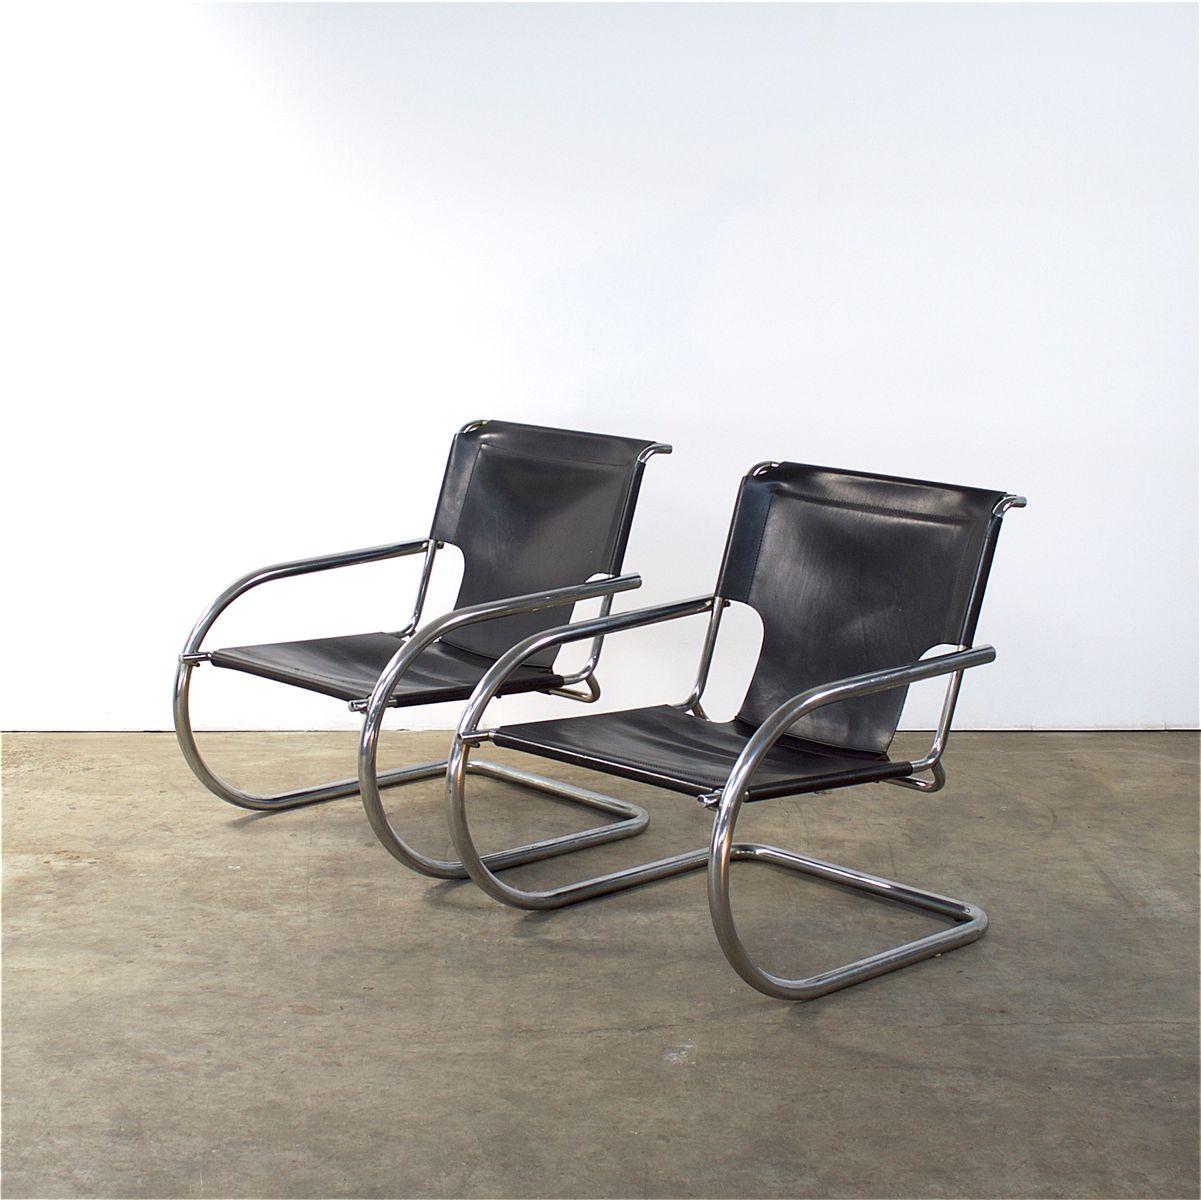 italienische vintage sessel aus chrom leder von arrben. Black Bedroom Furniture Sets. Home Design Ideas